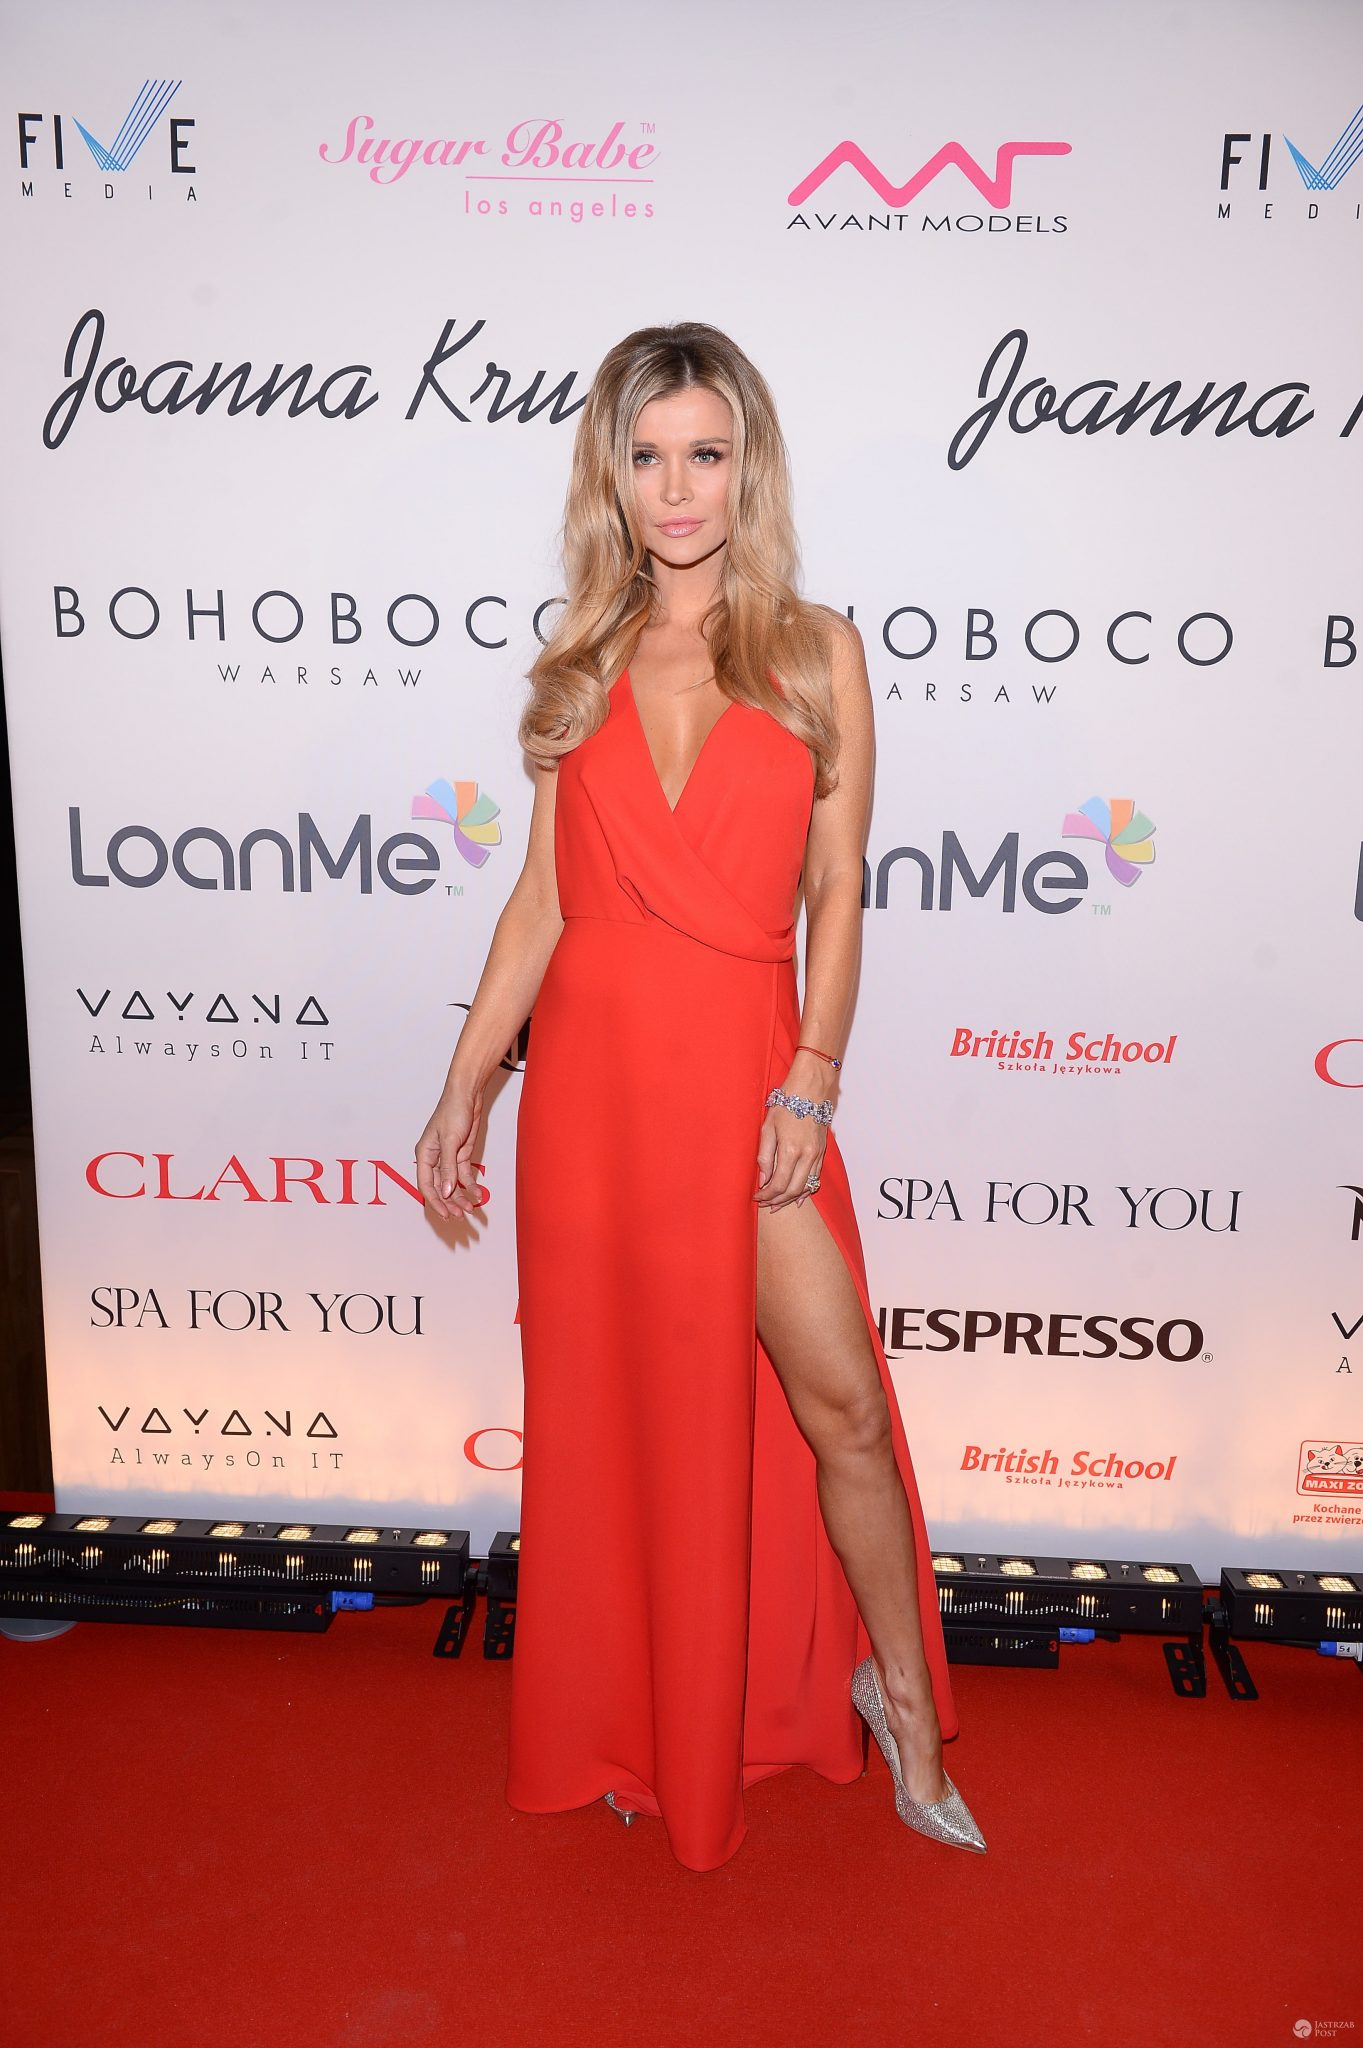 Joanna Krupa - Charytatywny koktajl u Joanny Krupy 2016